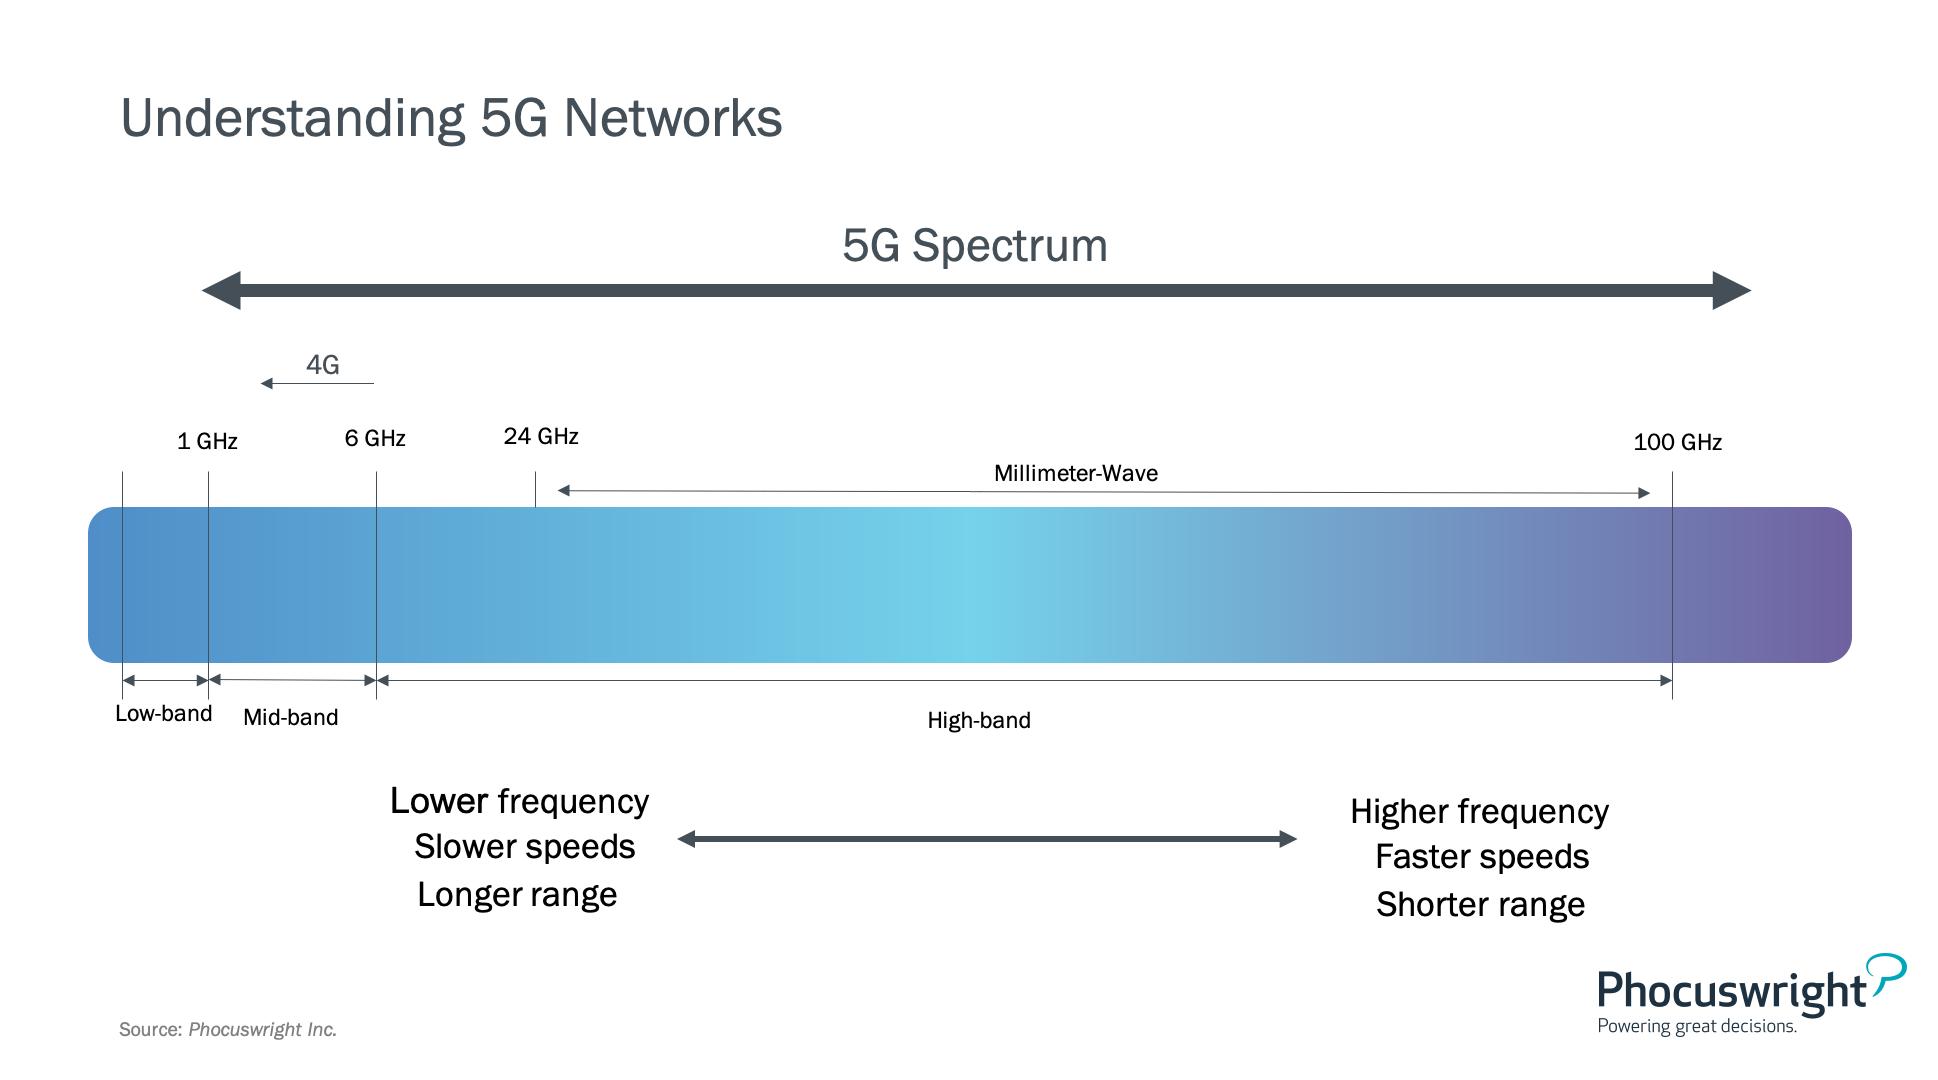 Phocuswright Chart: Understanding 5G Networks